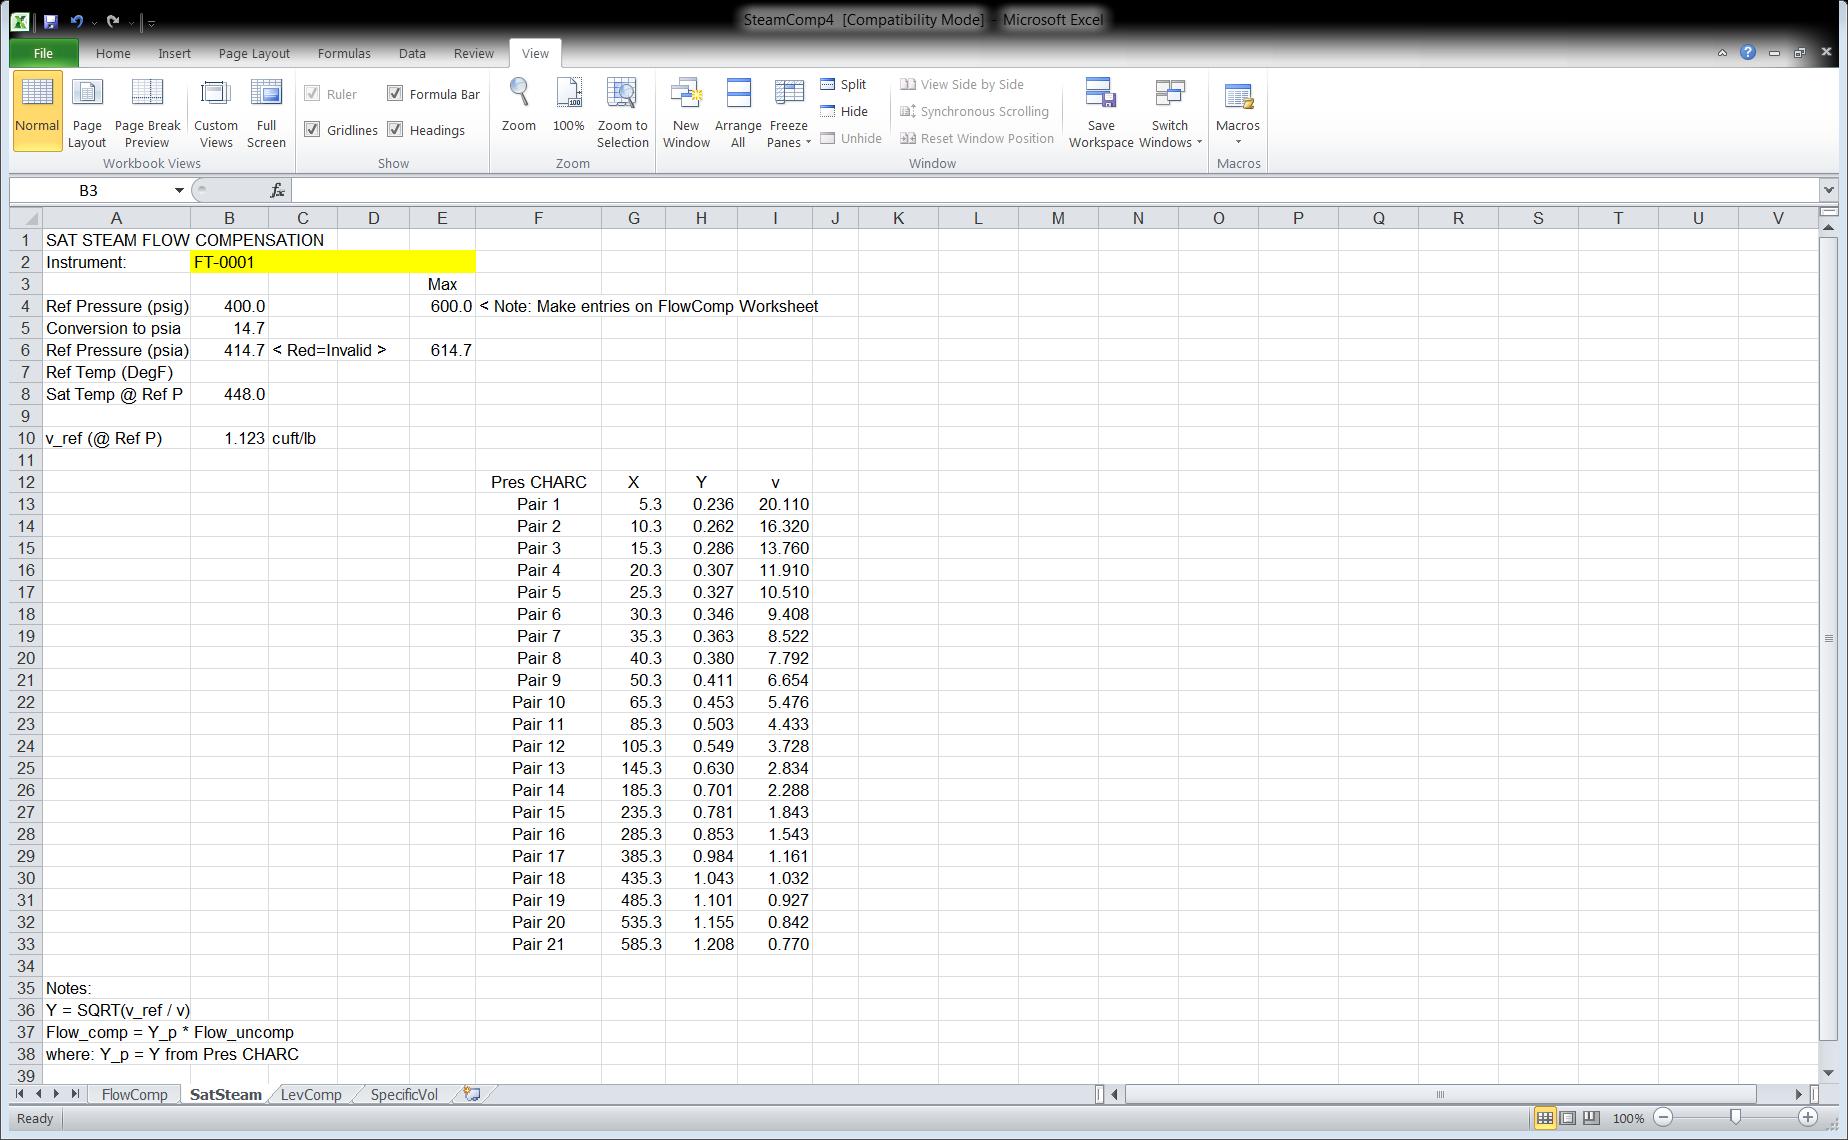 Figure 5 Excel Spreadsheet SteamComp4 Tab SatSteam